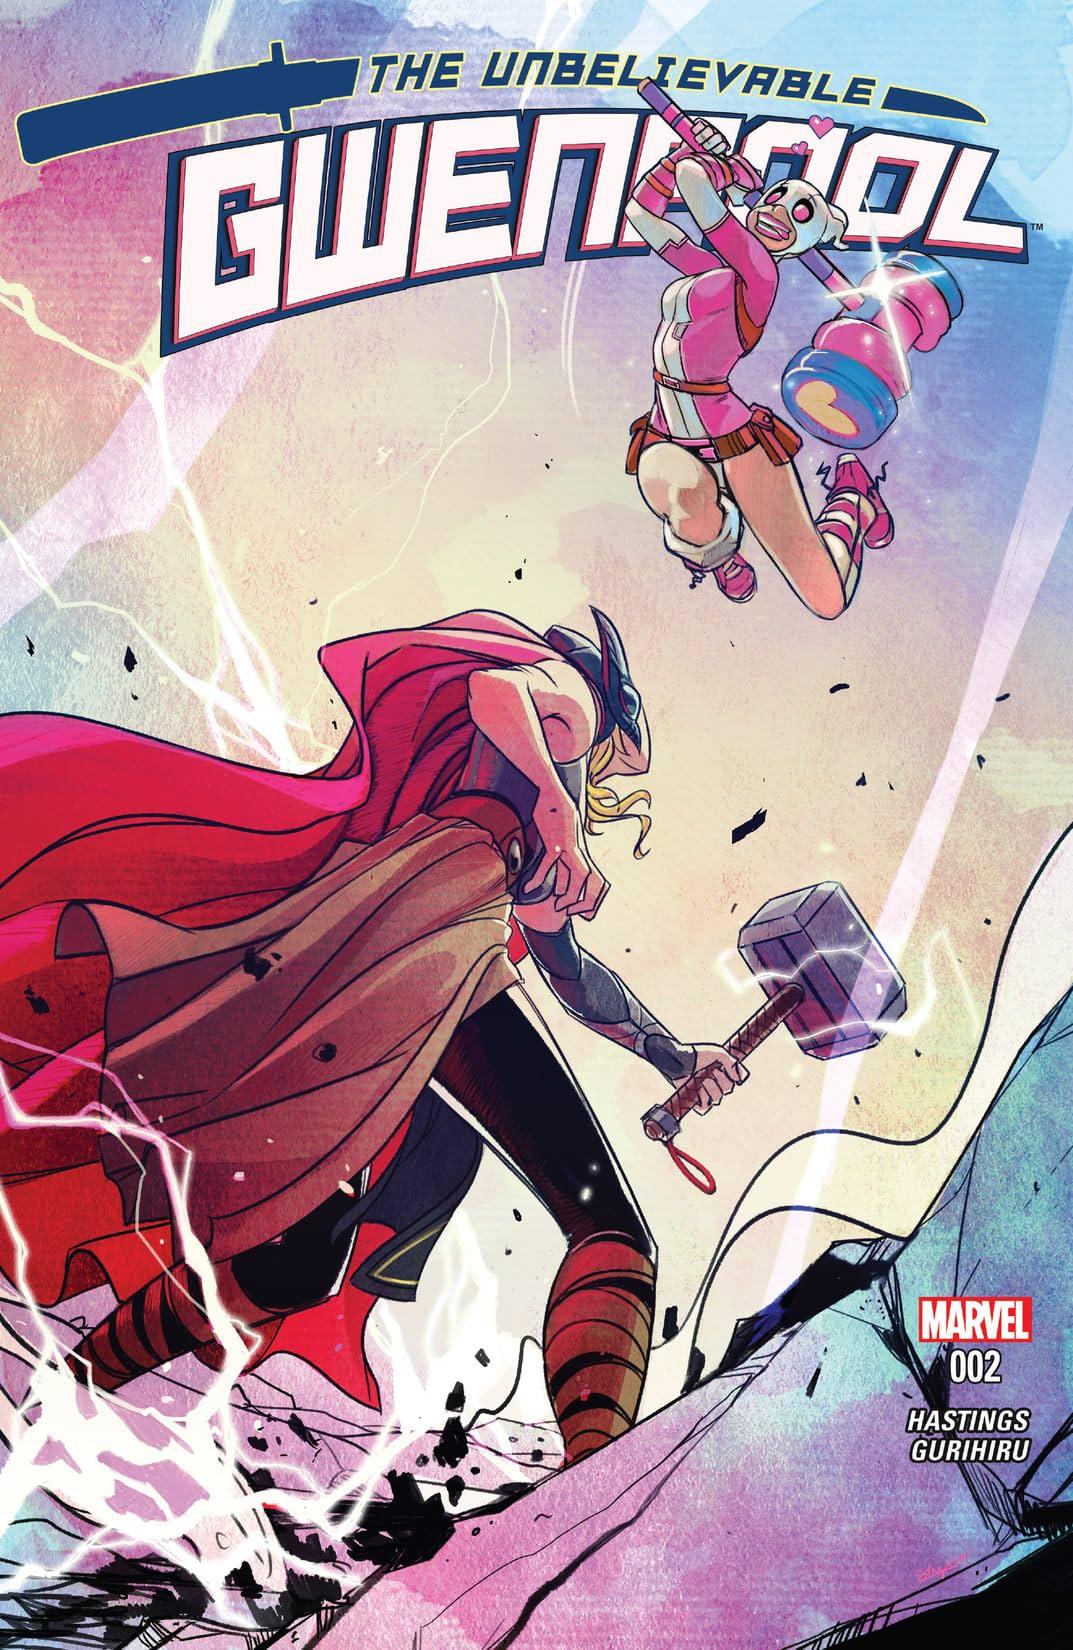 Gwenpool, The Unbelievable (2016-2018) #2